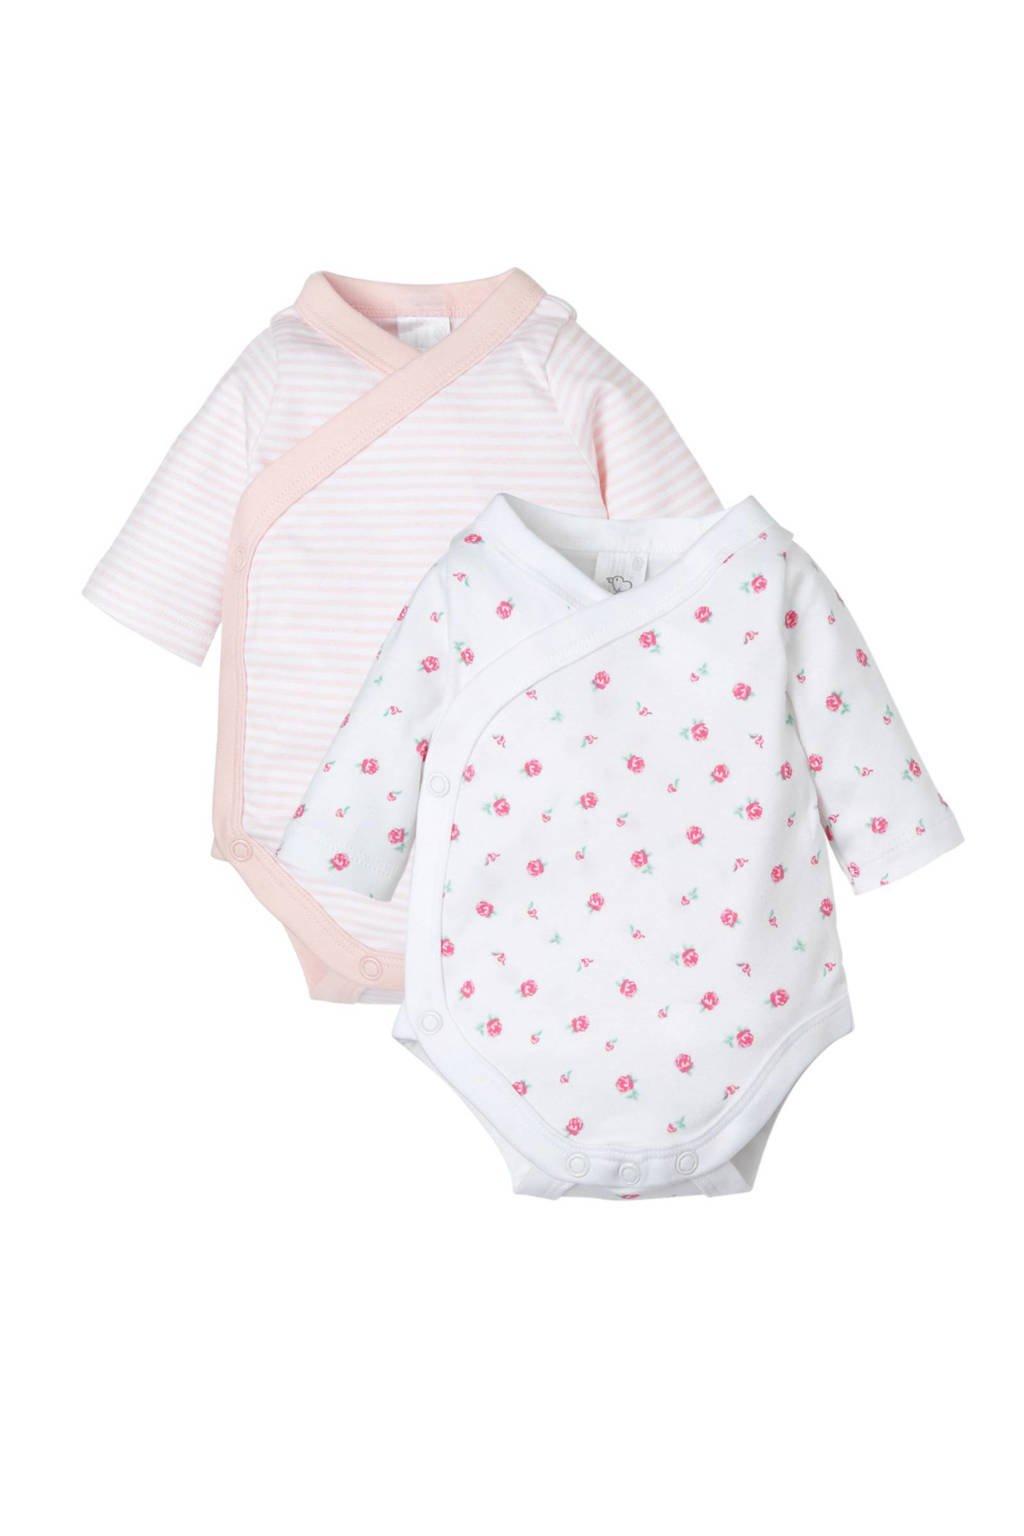 C&A Baby Newborn newborn romper - set van 2, Roze/wit